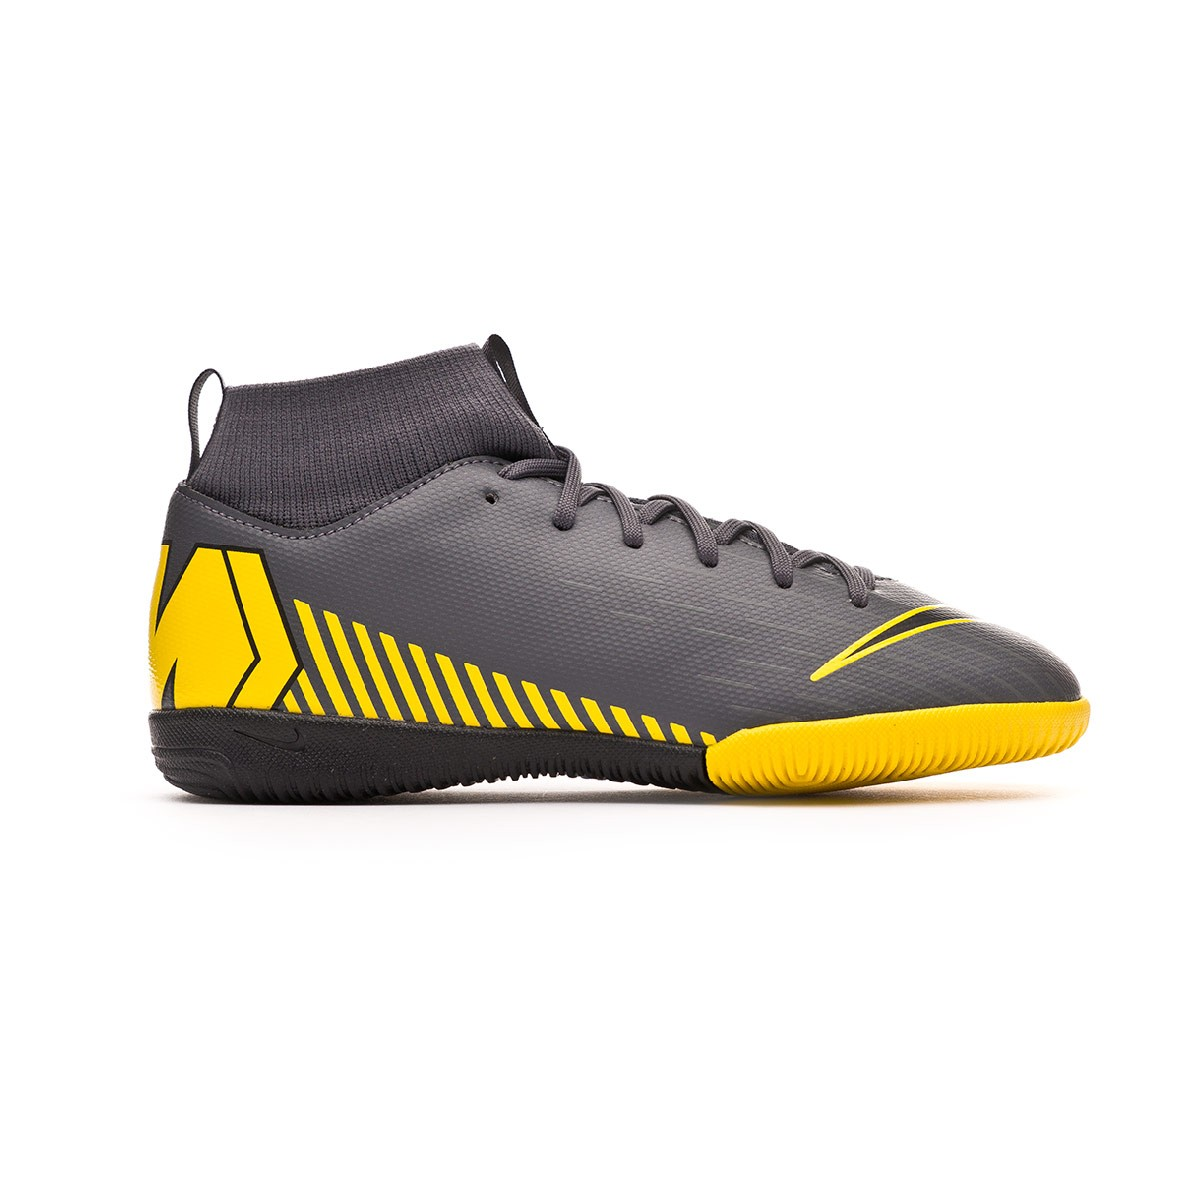 Chaussure de futsal Nike Mercurial SuperflyX VI Academy IC enfant